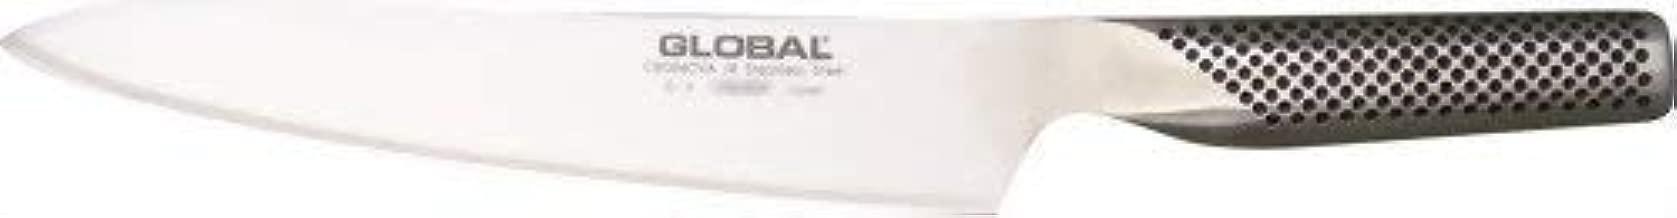 Global G-3-8 1/4 inch, 21cm Carving Knife